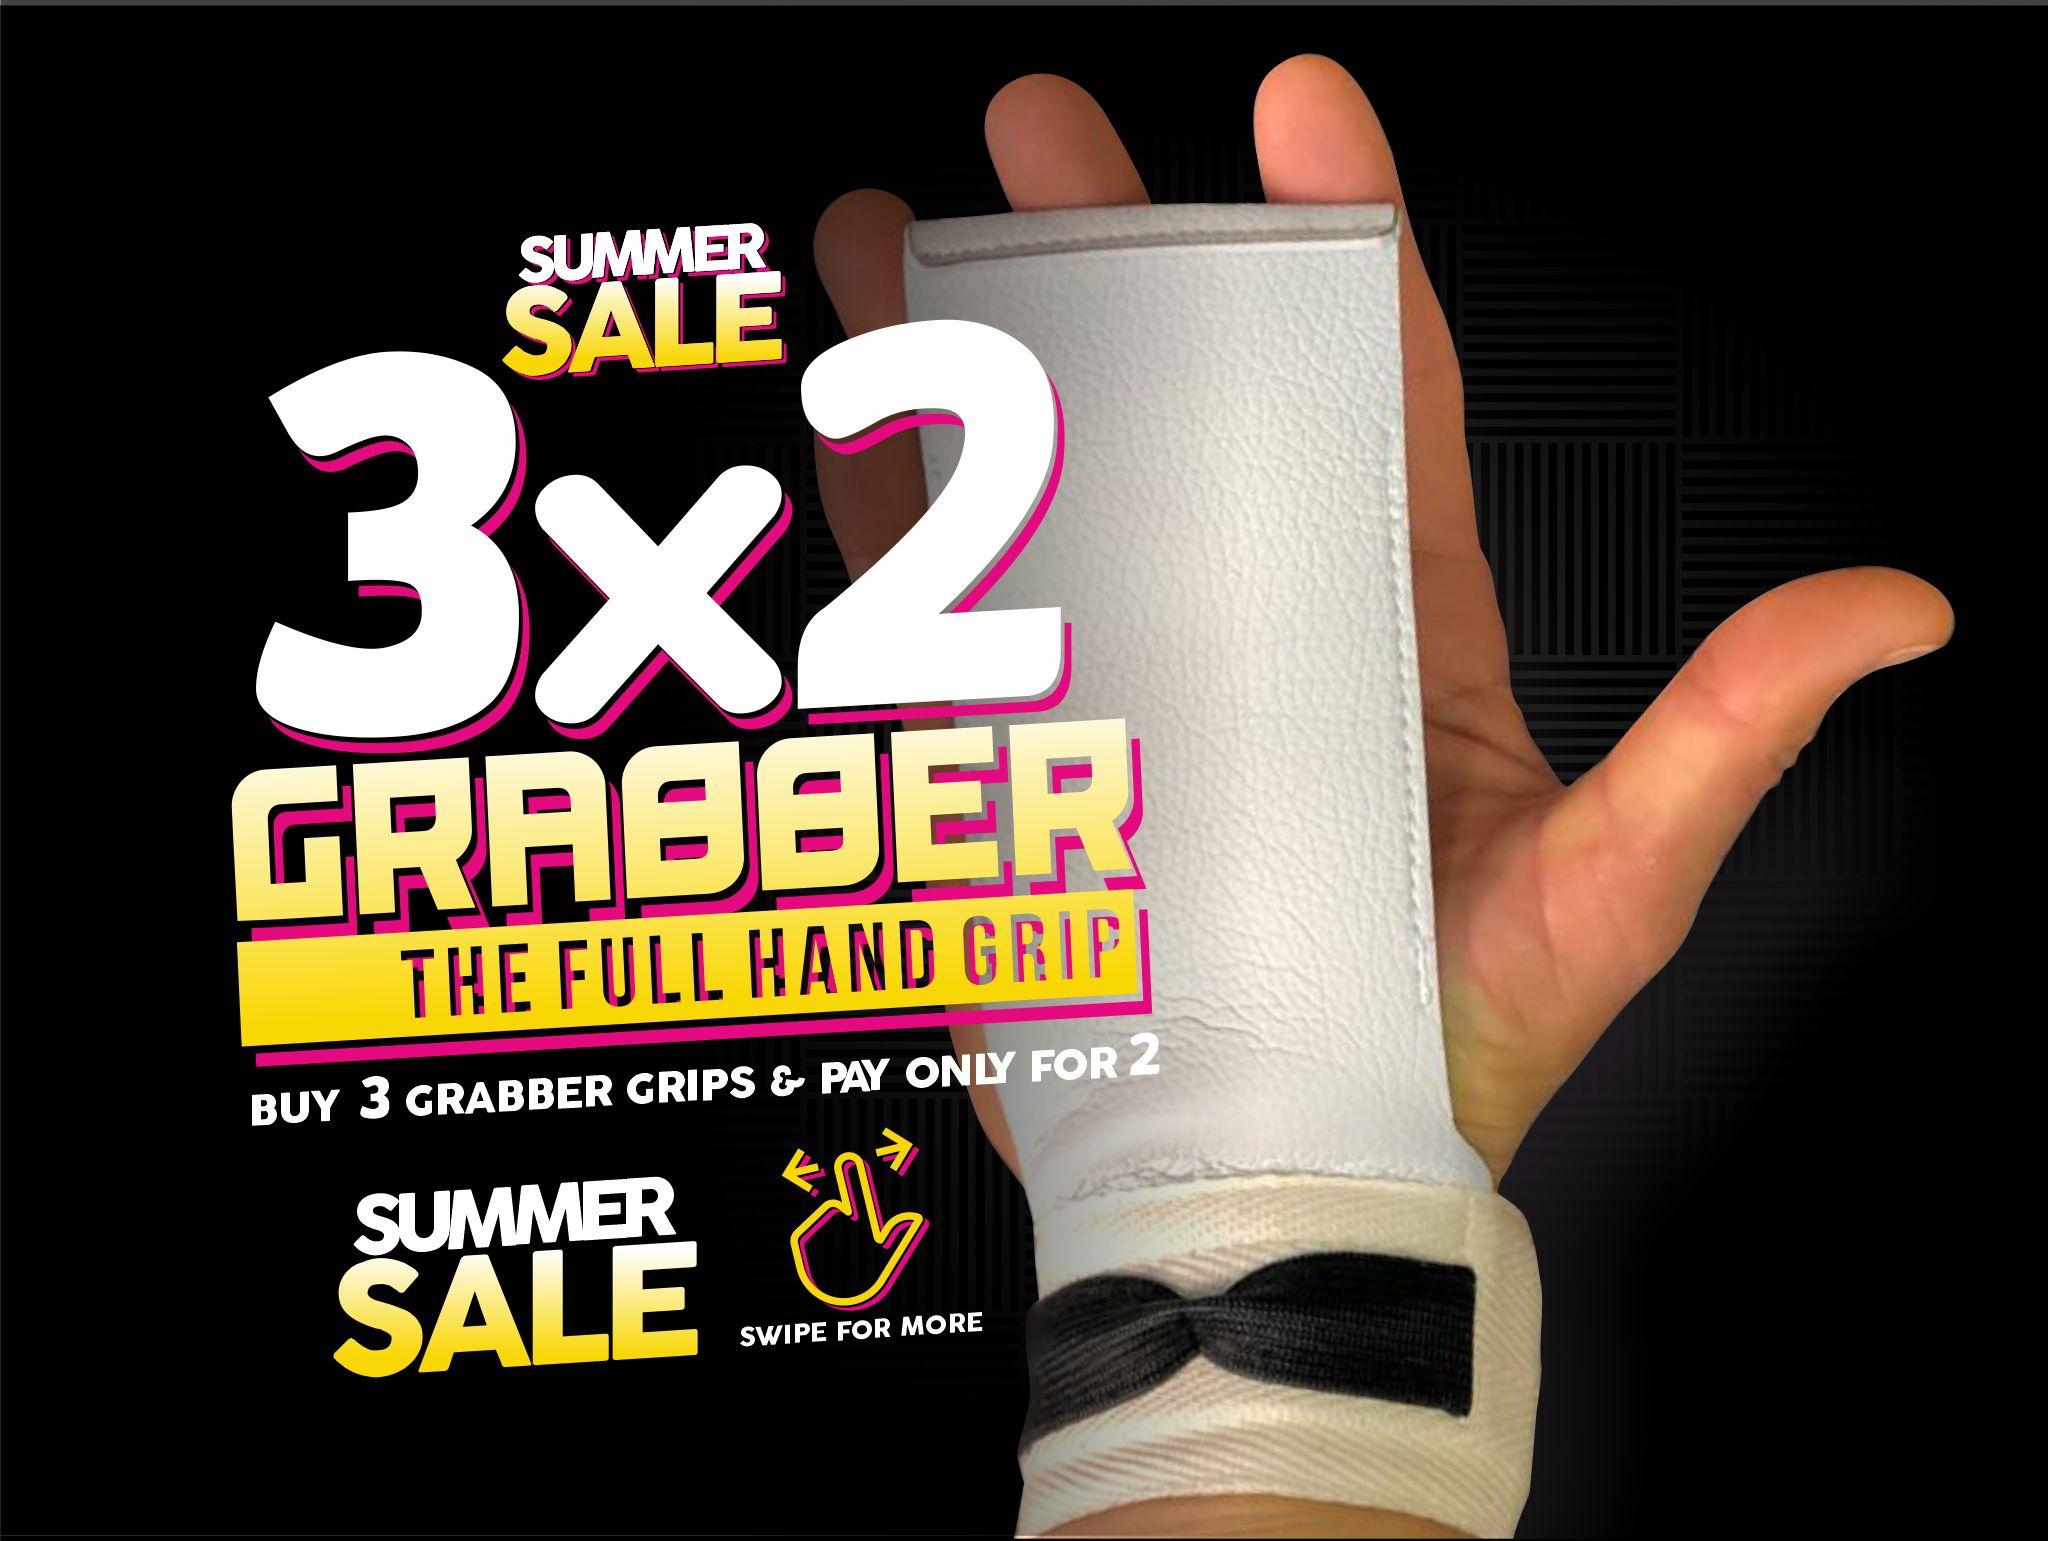 wyn-summer-sale2020-grabber-mobile